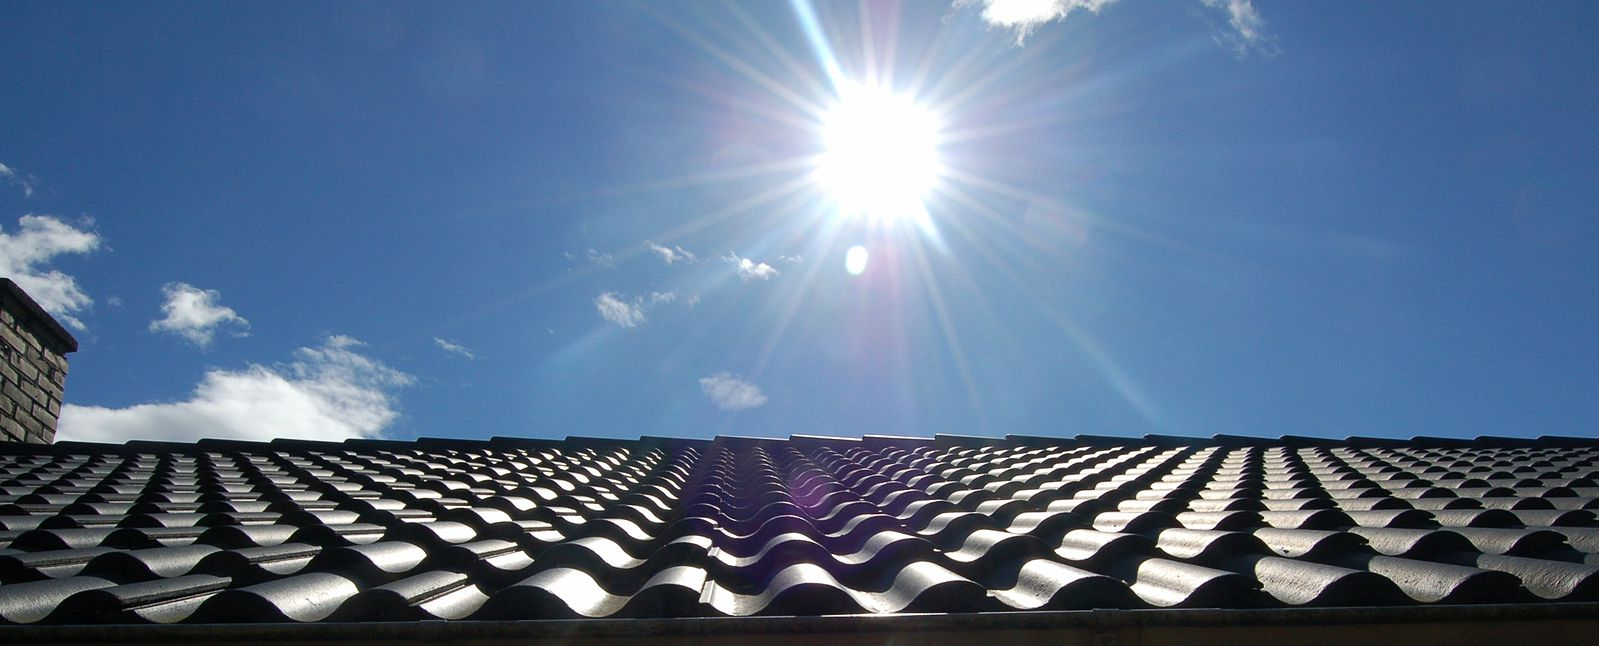 Summer Roofing Damage